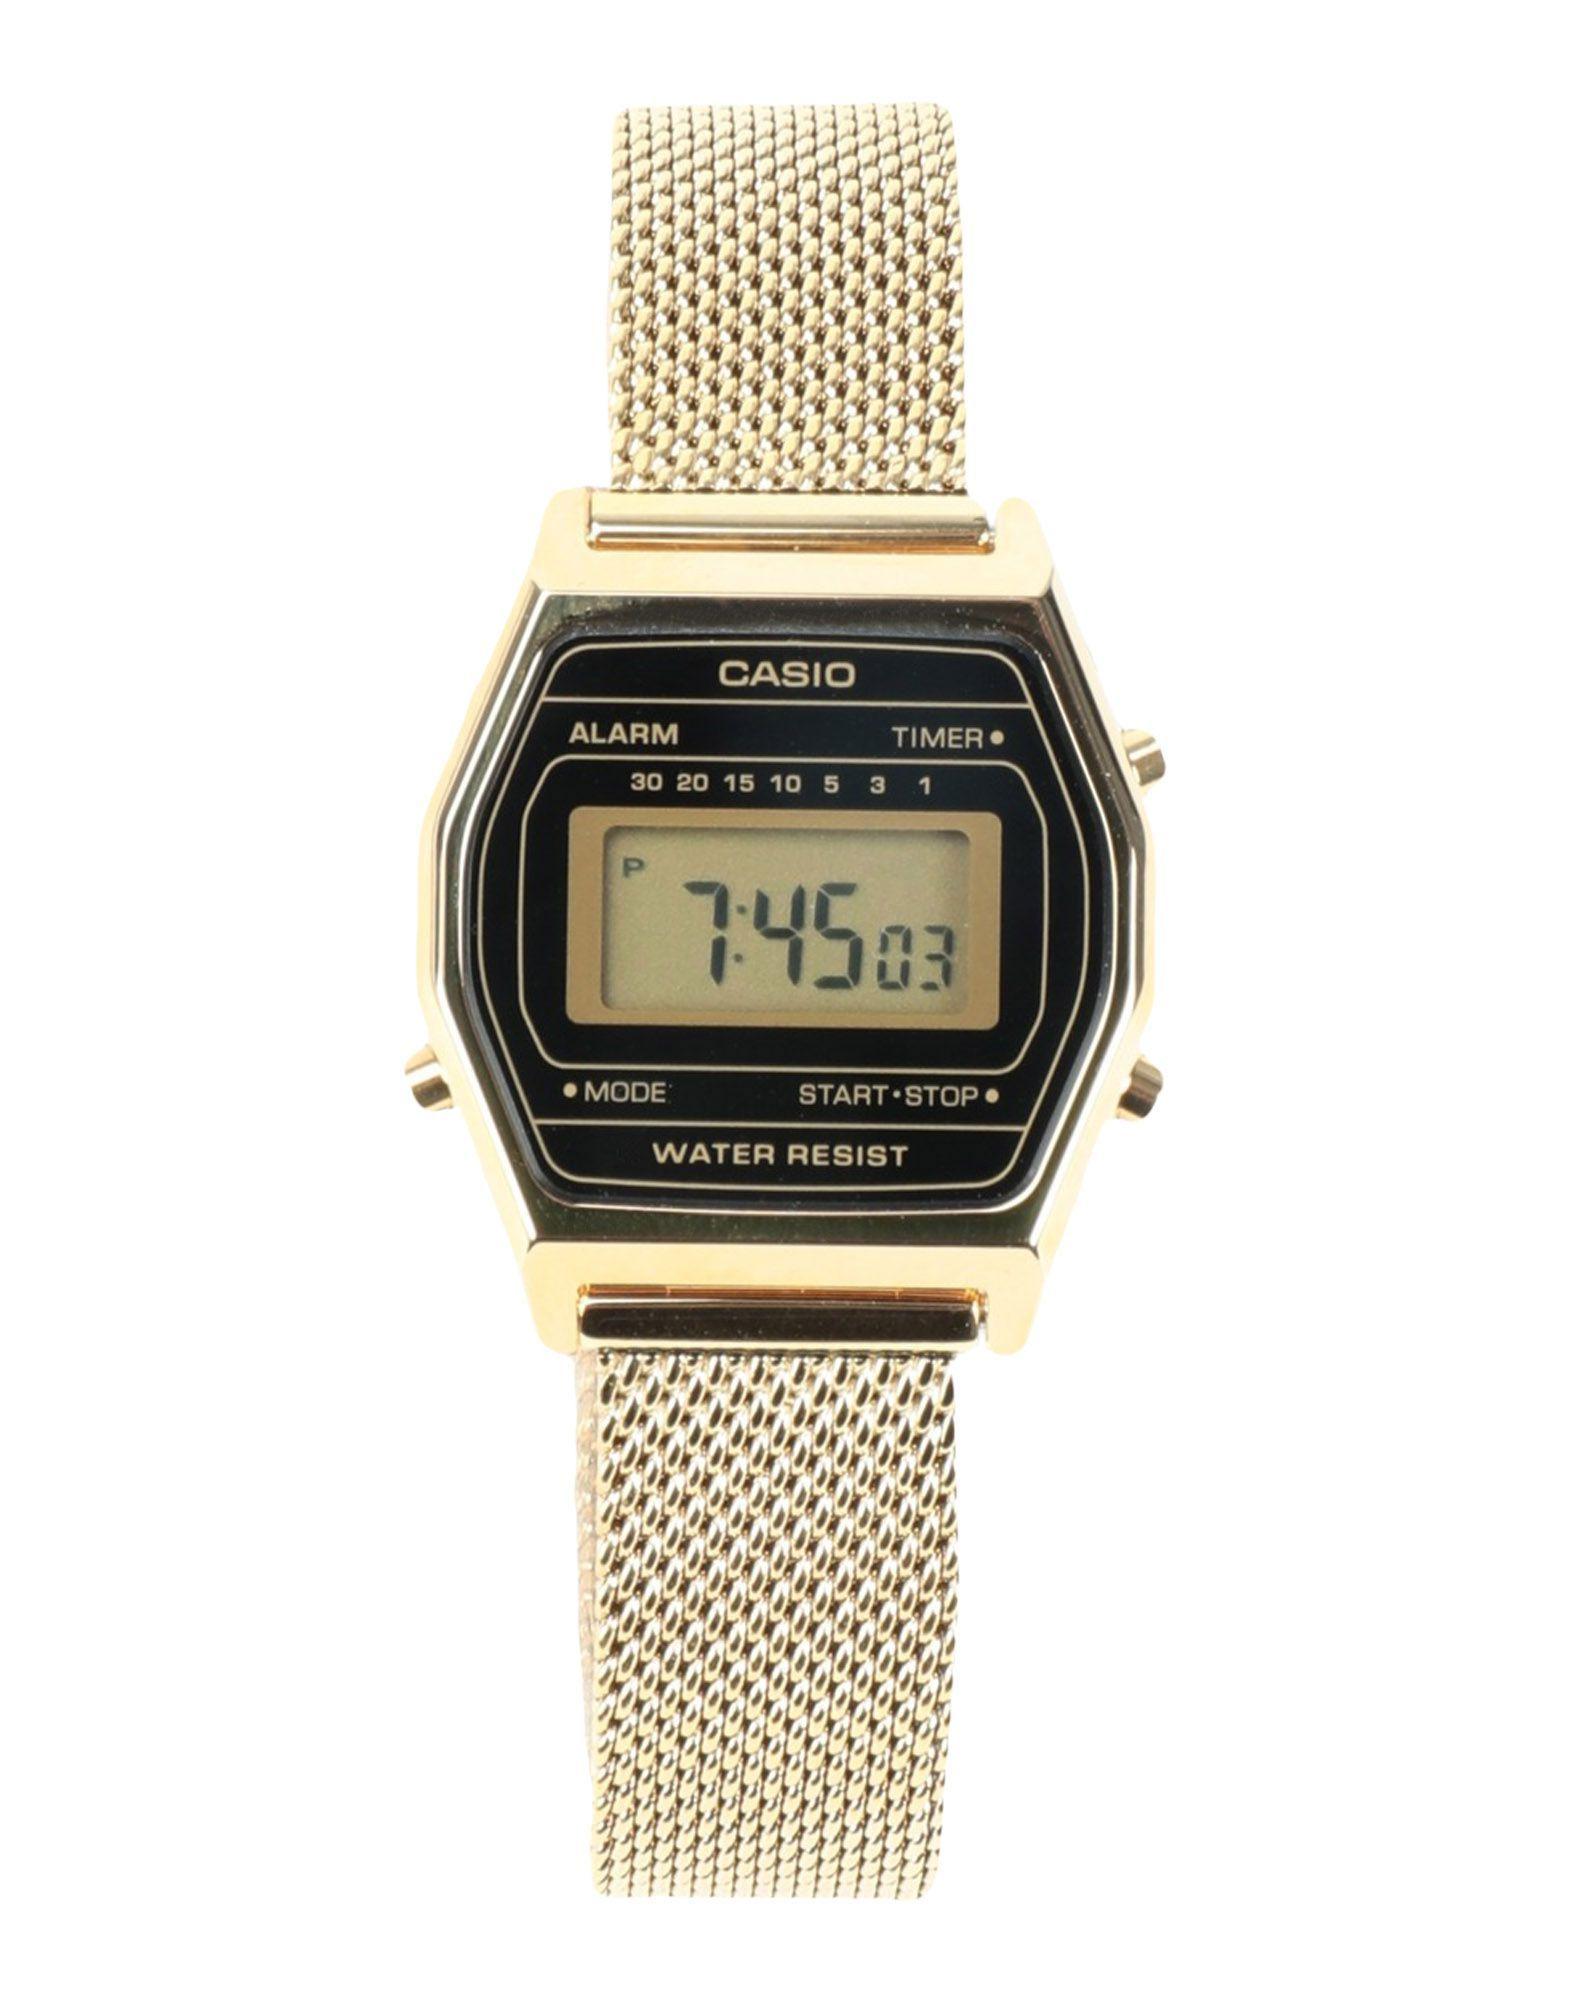 Casio Gold Stainless Steel Water Resistant Digital Watch